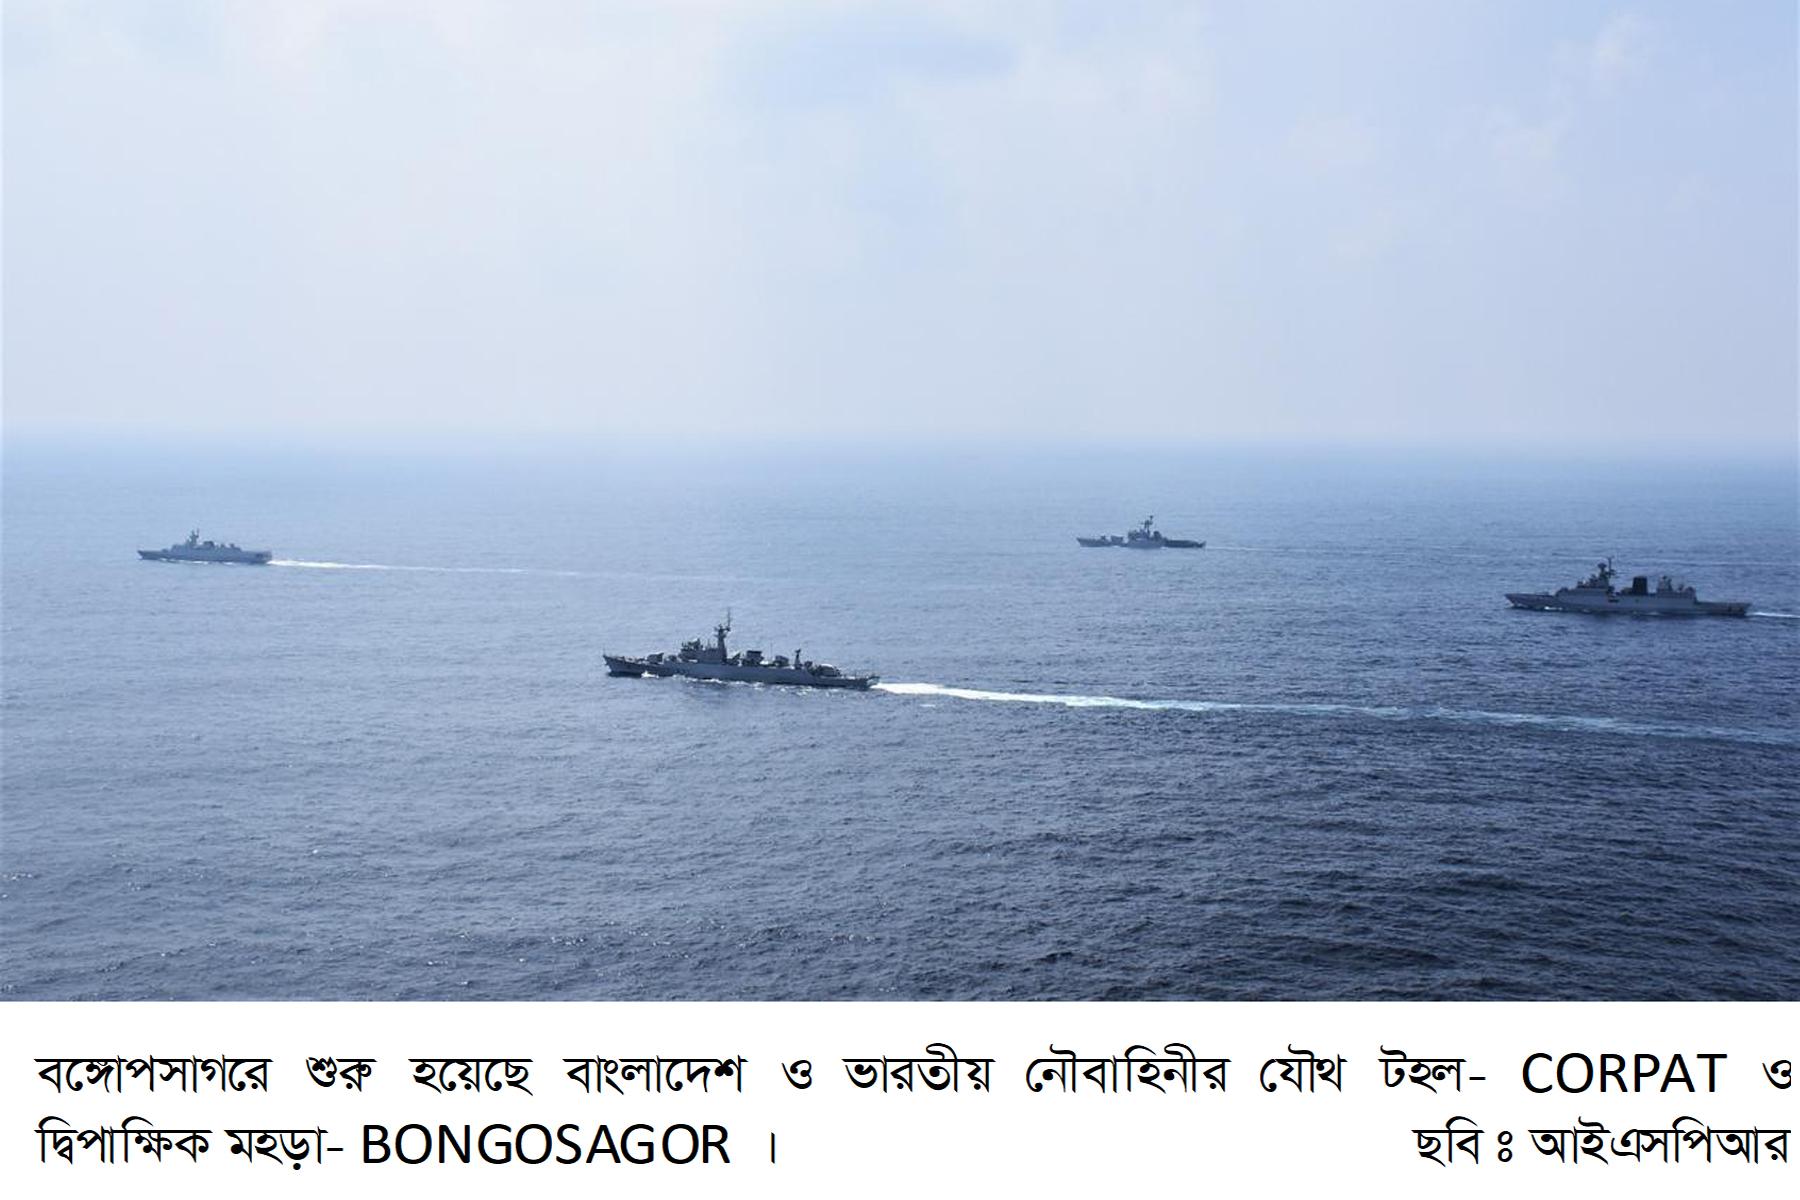 ISPR Navy - 03-10-2020 (4)